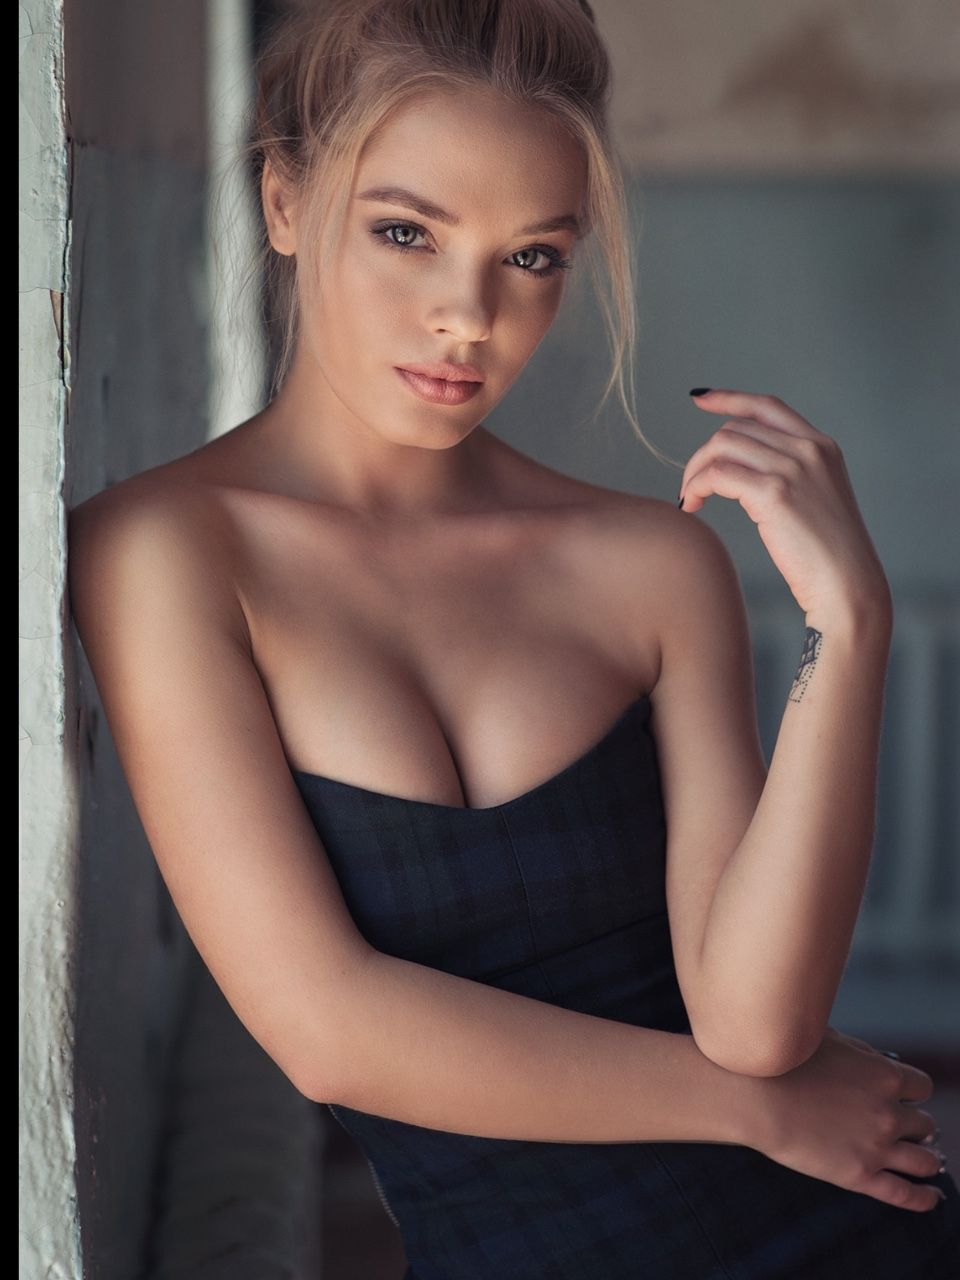 Female mature pleasure woman